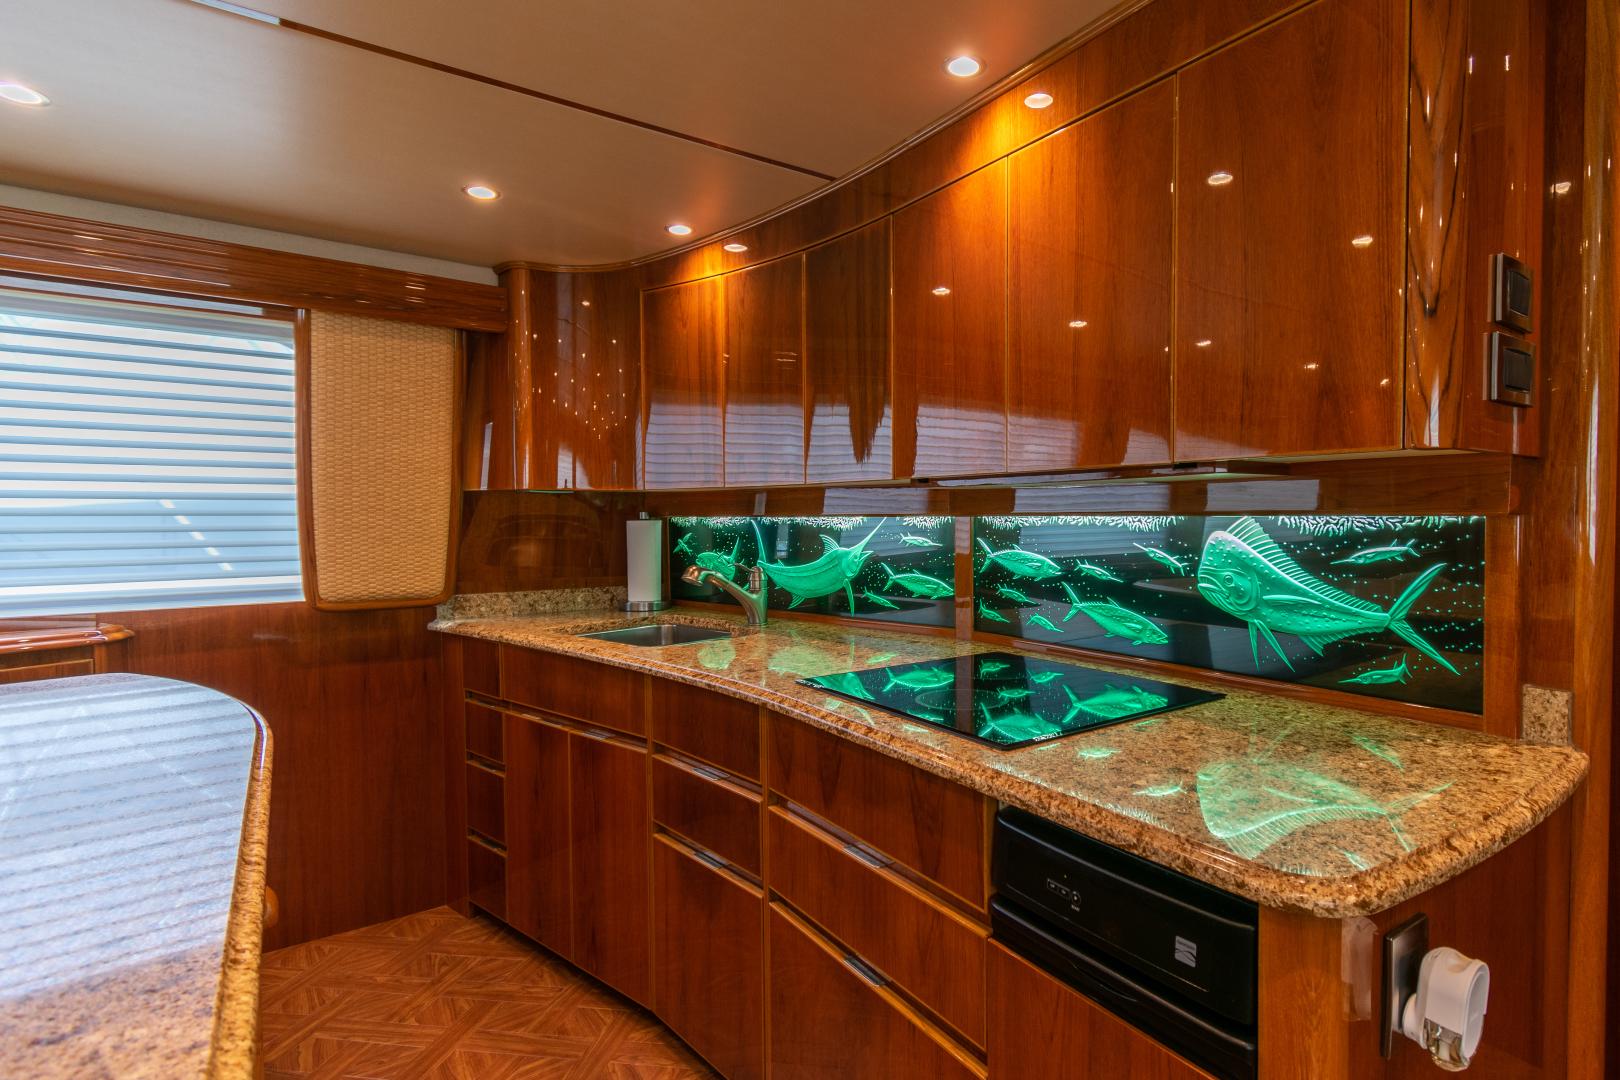 Viking-70 Convertible 2014-Load N Go Port Aransas-Texas-United States-2014 70 Viking Load N Go Galley (3)-1380510 | Thumbnail